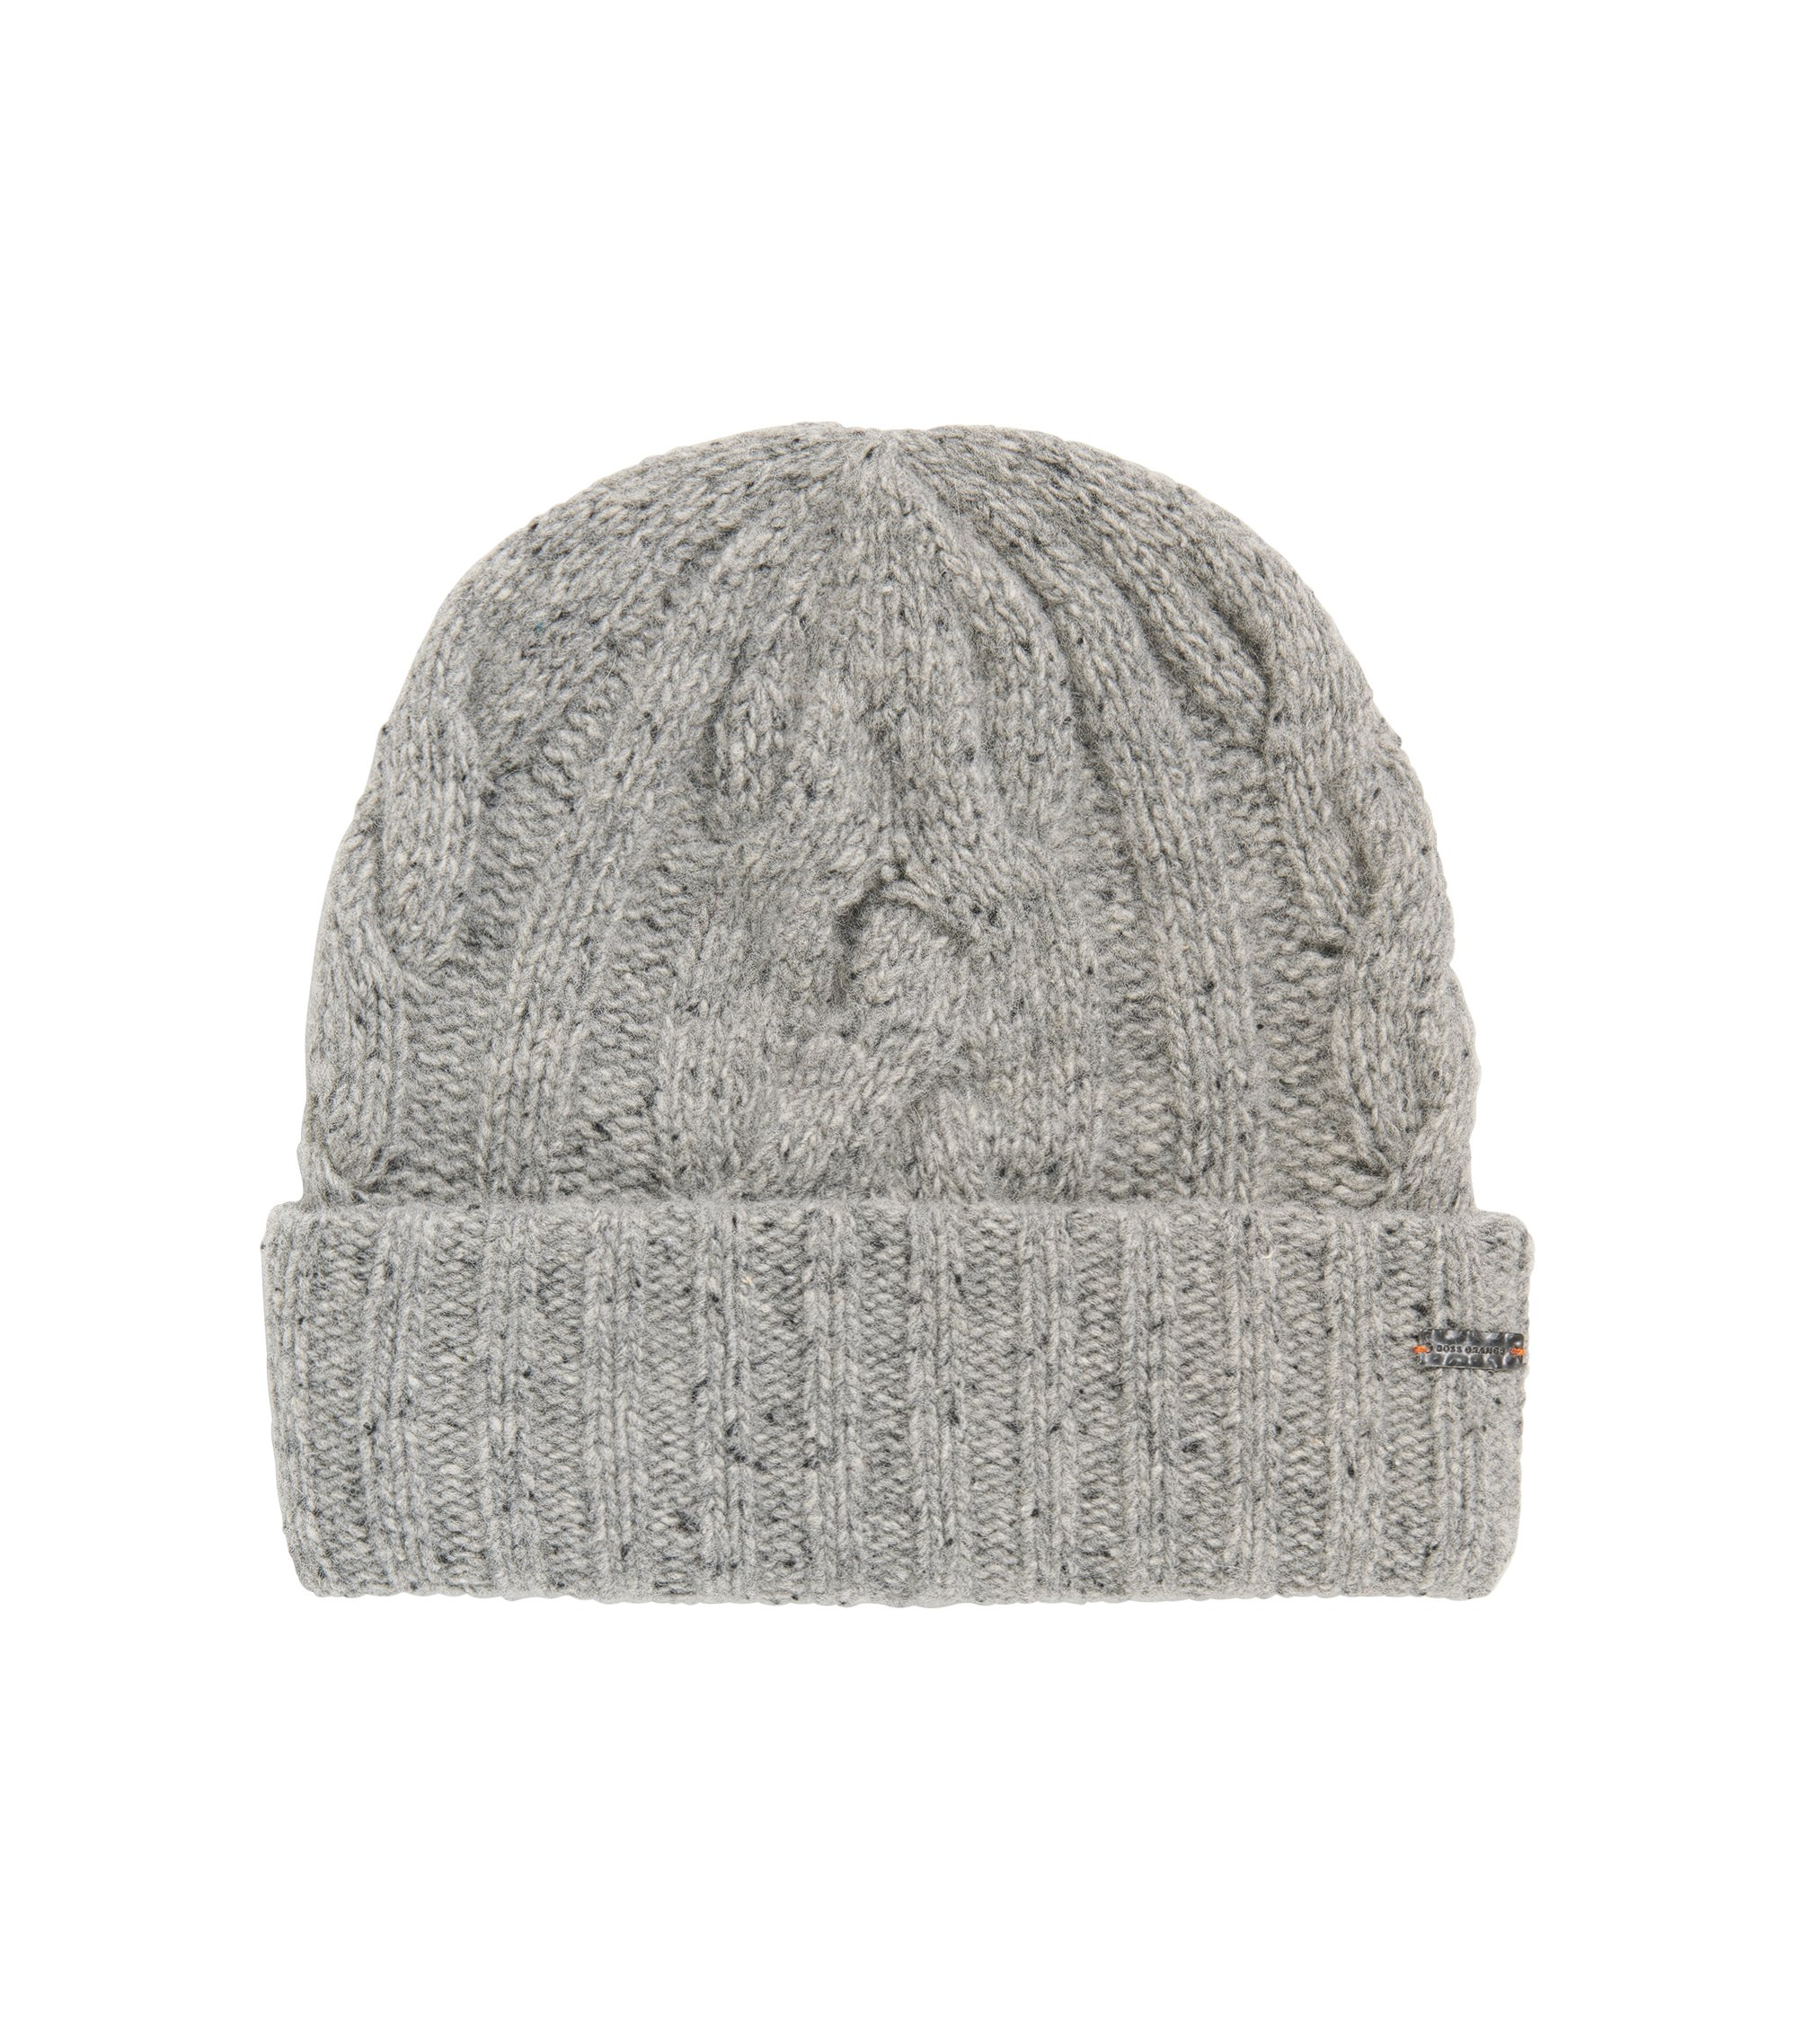 Mehrfarbige Mütze aus Woll-Mix mit Zopfmuster, Grau